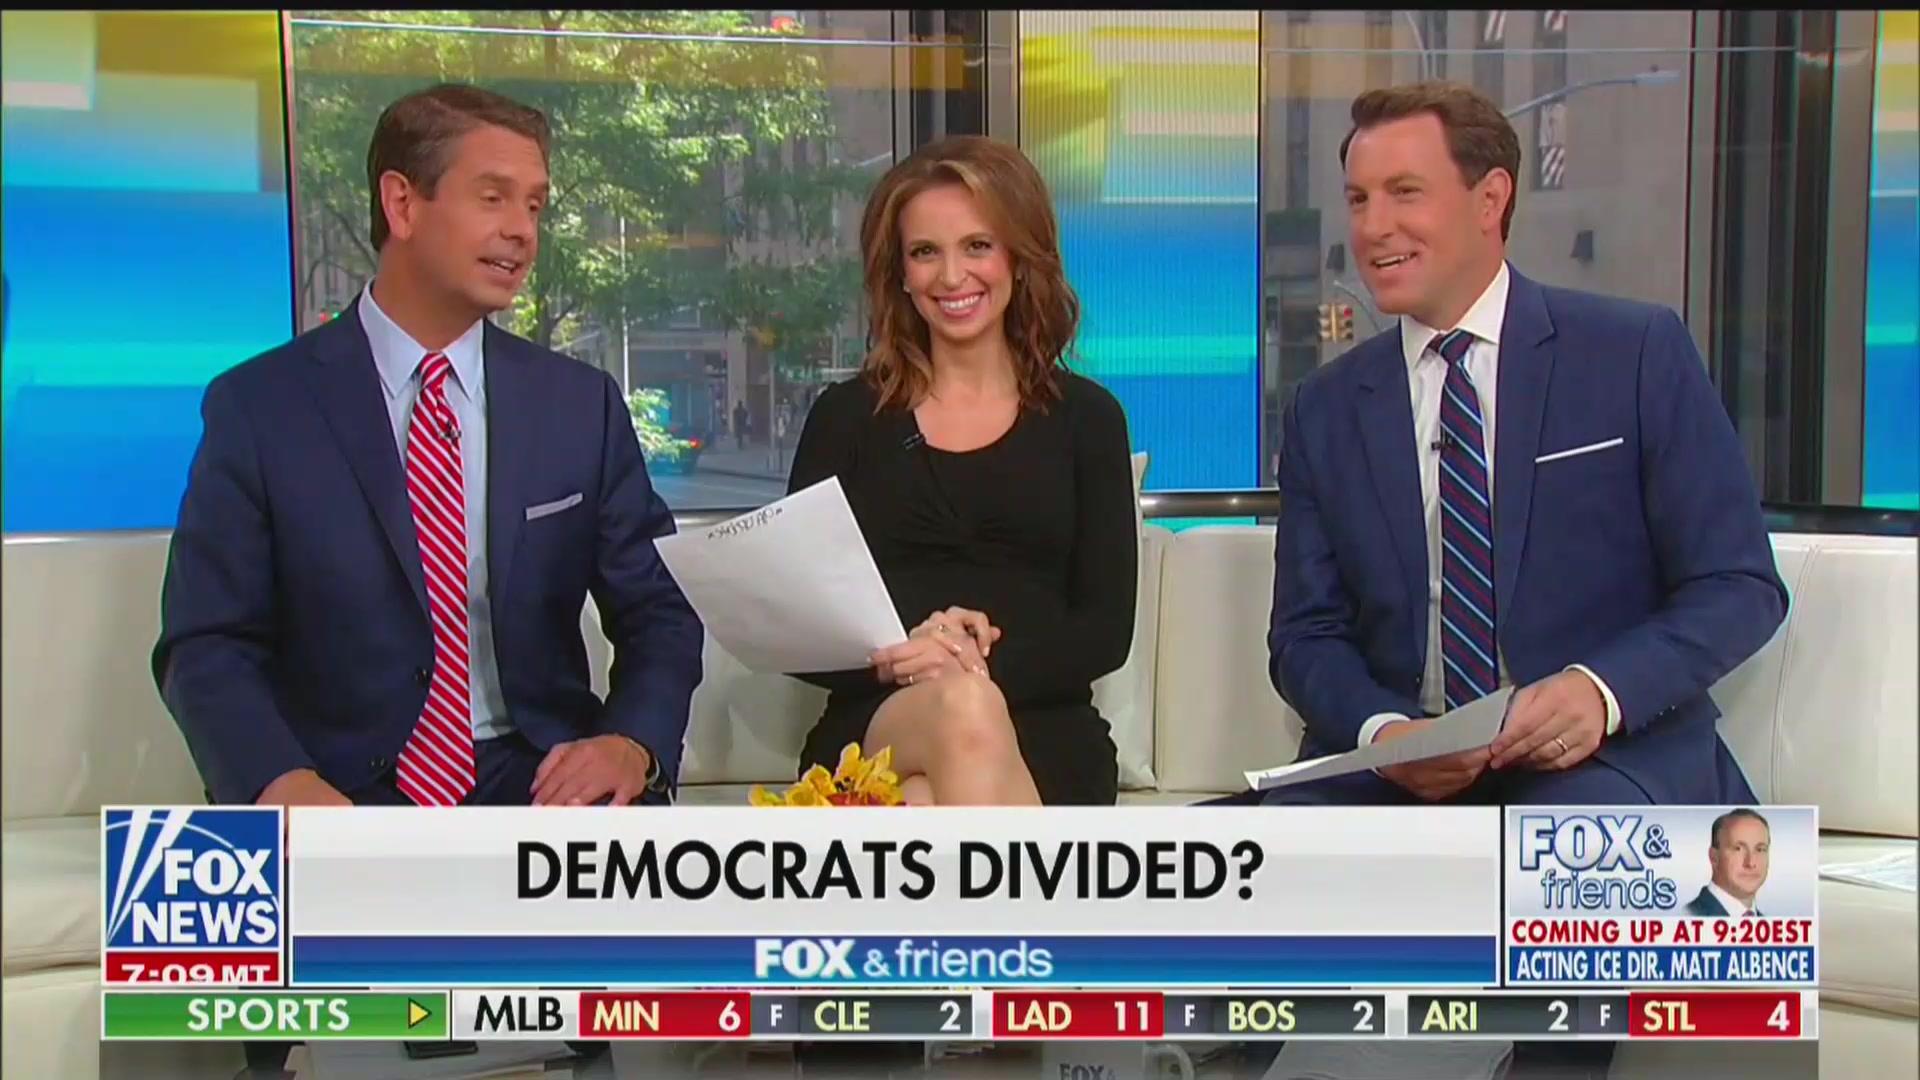 'Fox & Friends' Laughs at Trump's Racist Tweets Targeting Congresswomen of Color: 'Very Comedic'